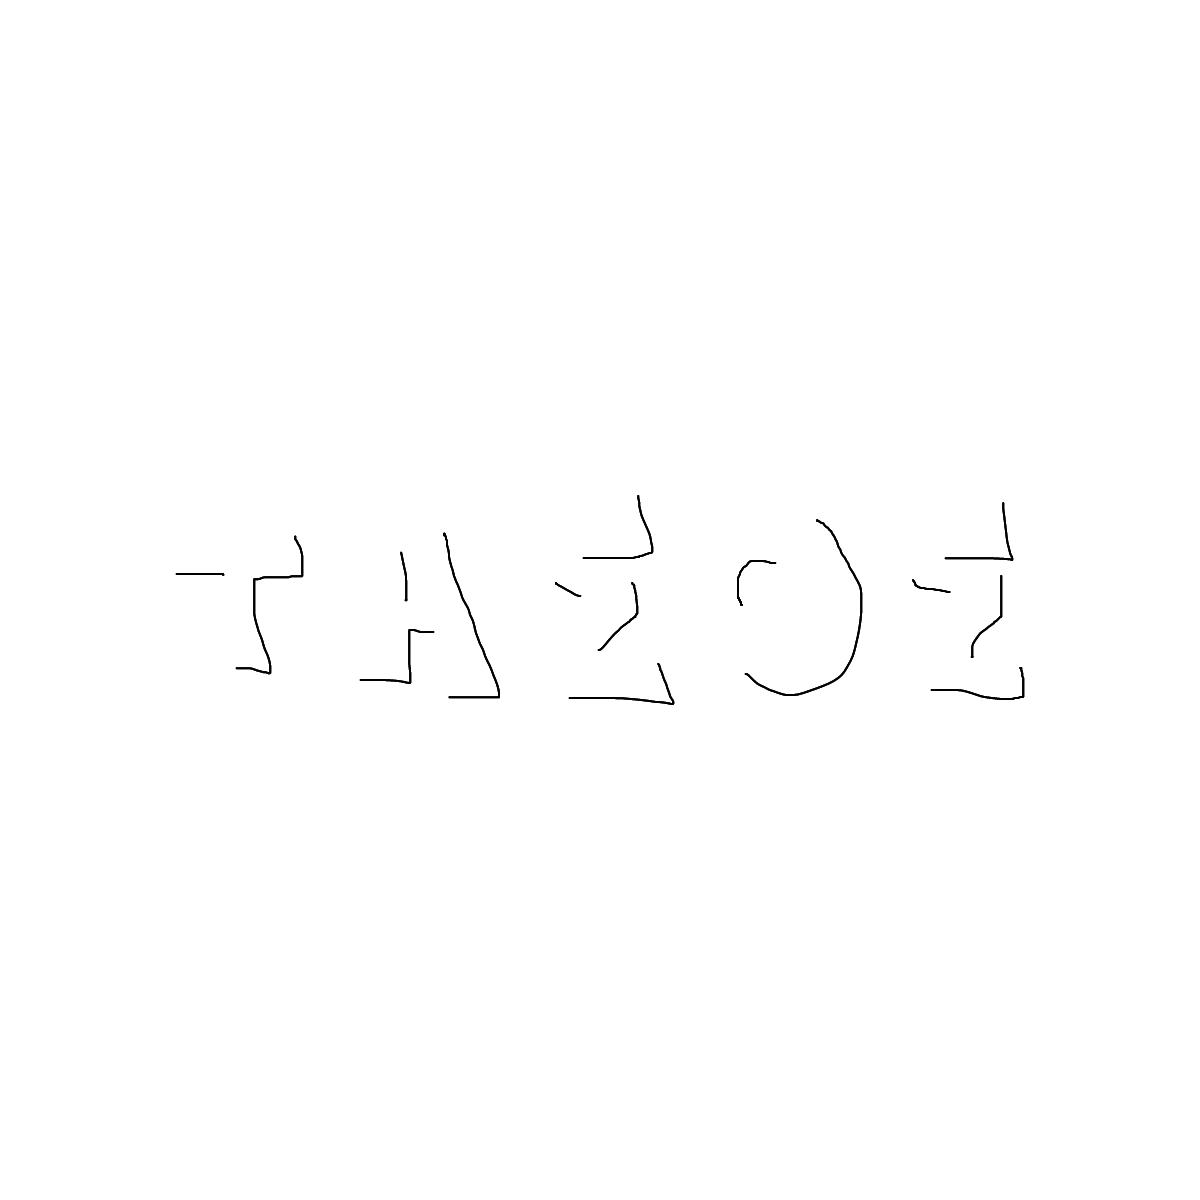 BAAAM drawing#5304 lat:37.6772994995117200lng: 21.9987506866455080